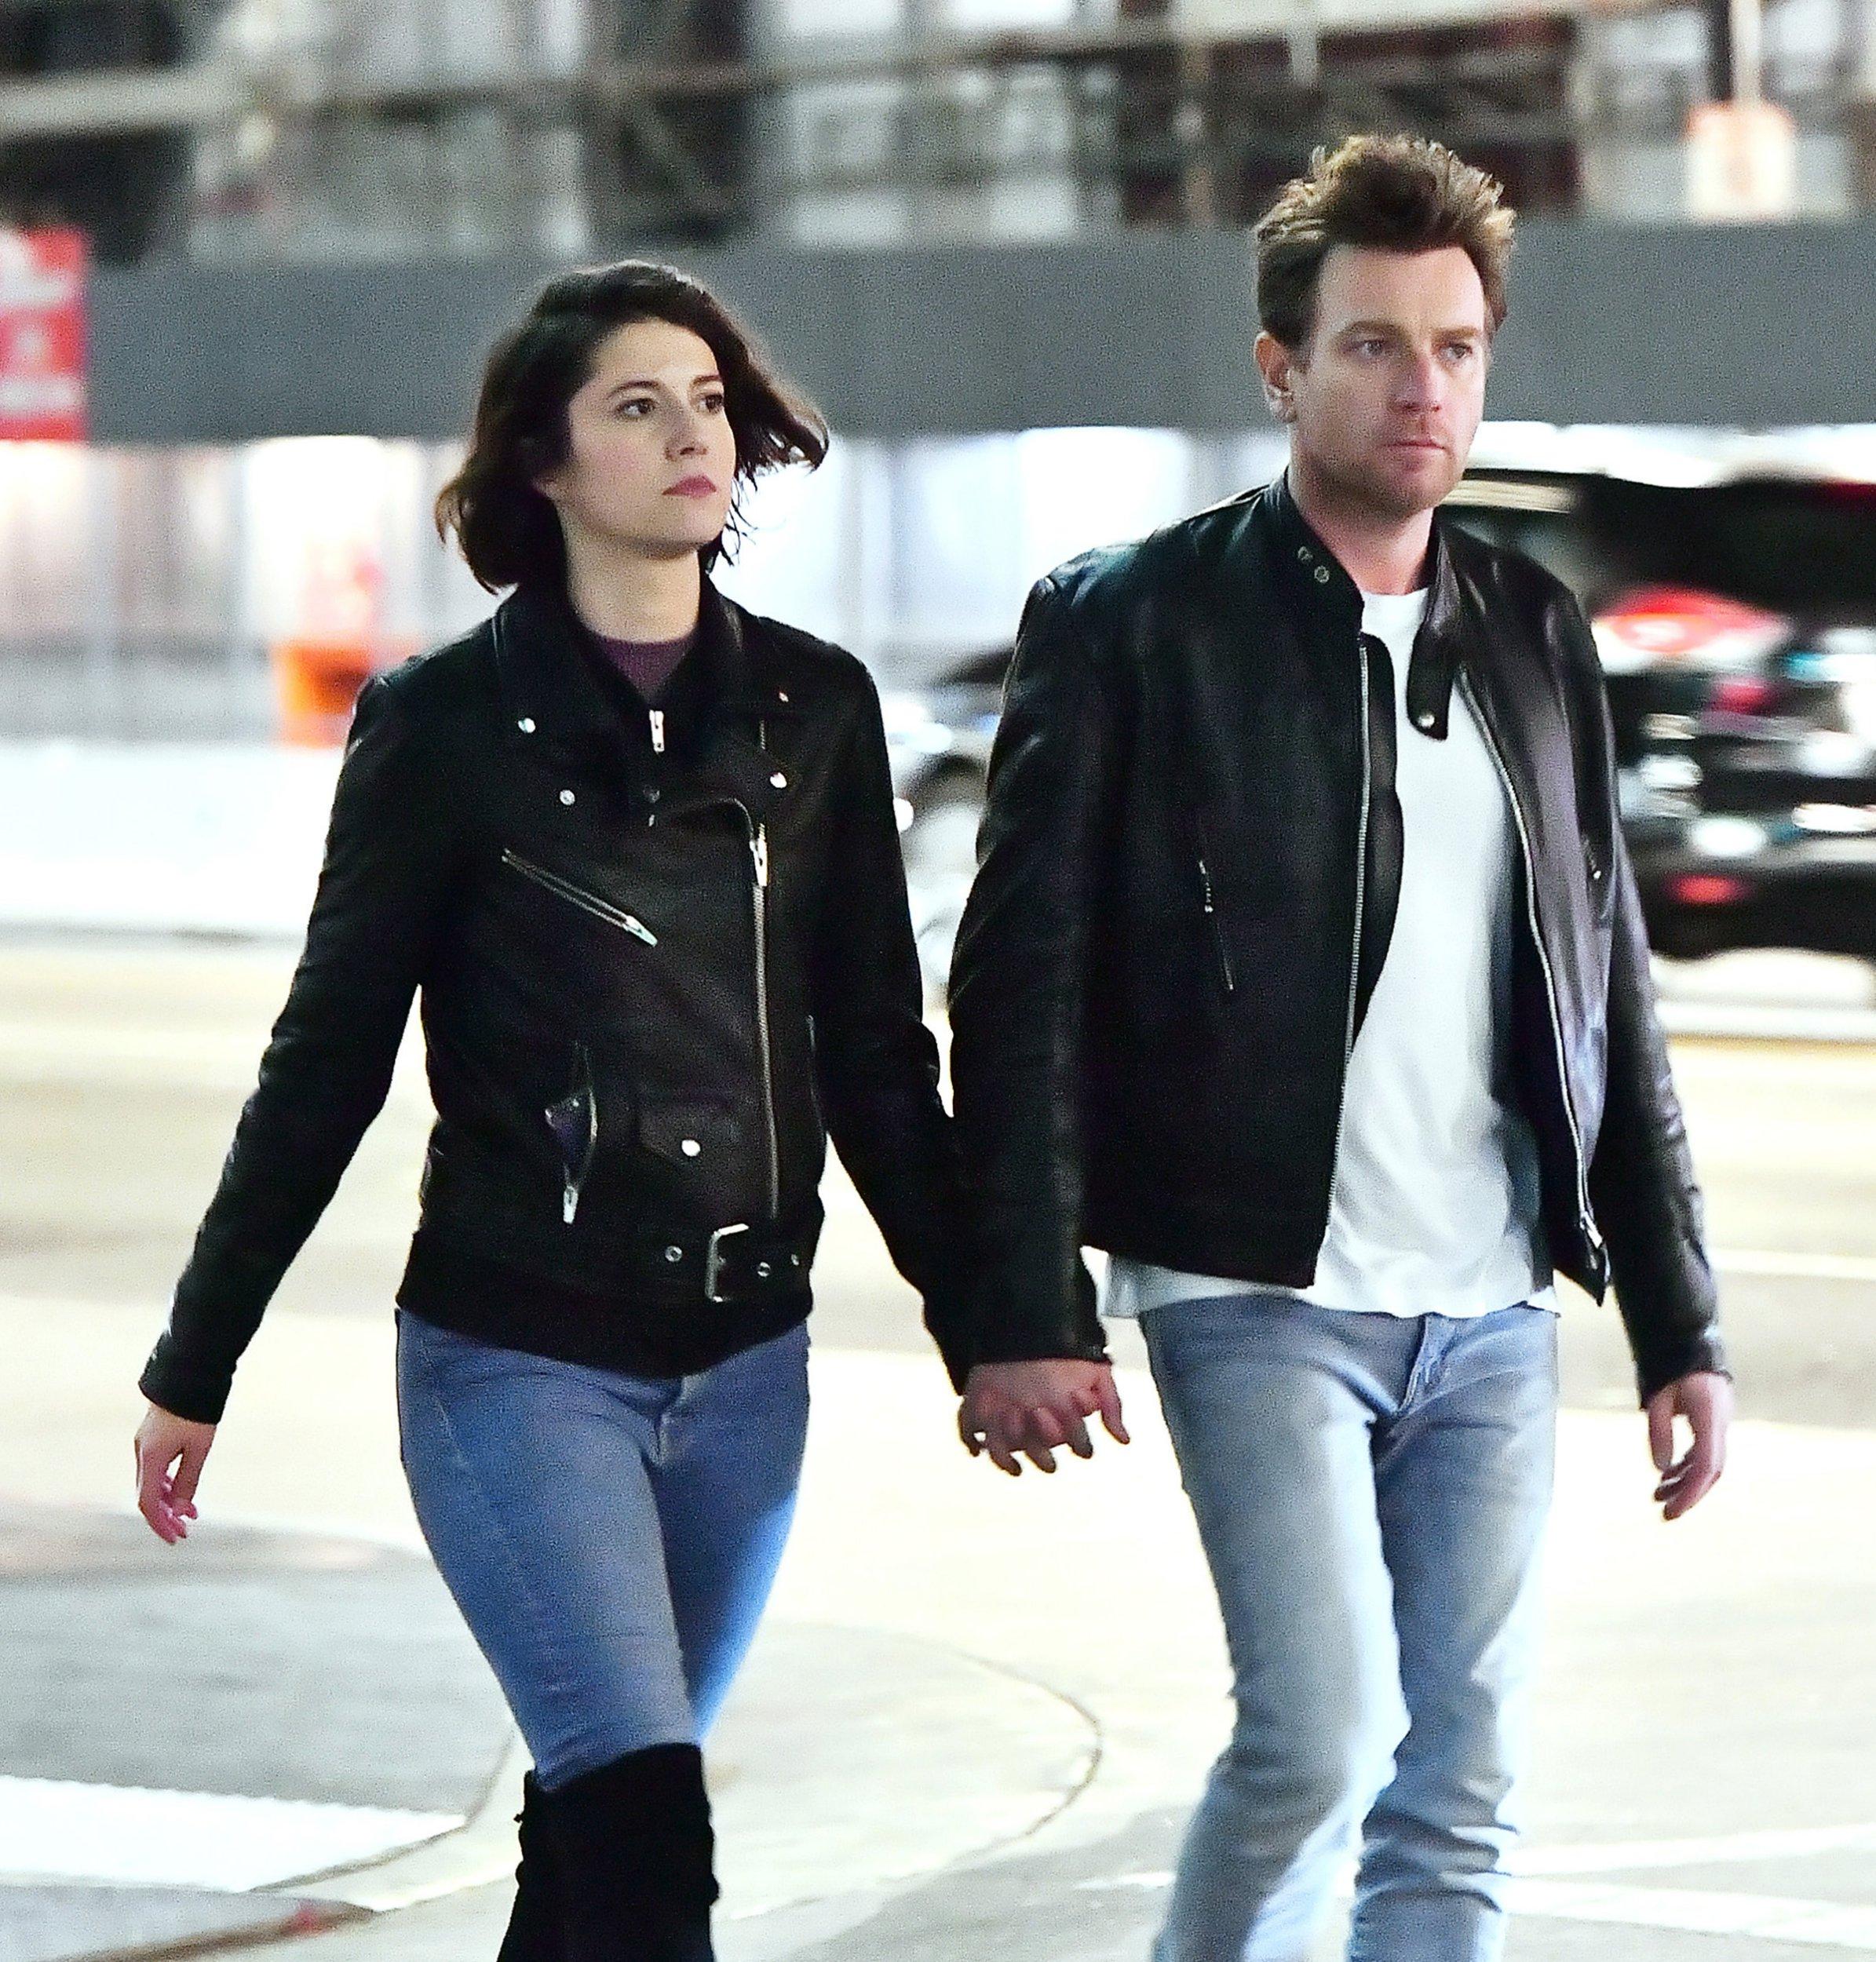 Ewan McGregor and Mary Elizabeth Winstead are hand-in-hand as they walk through LA